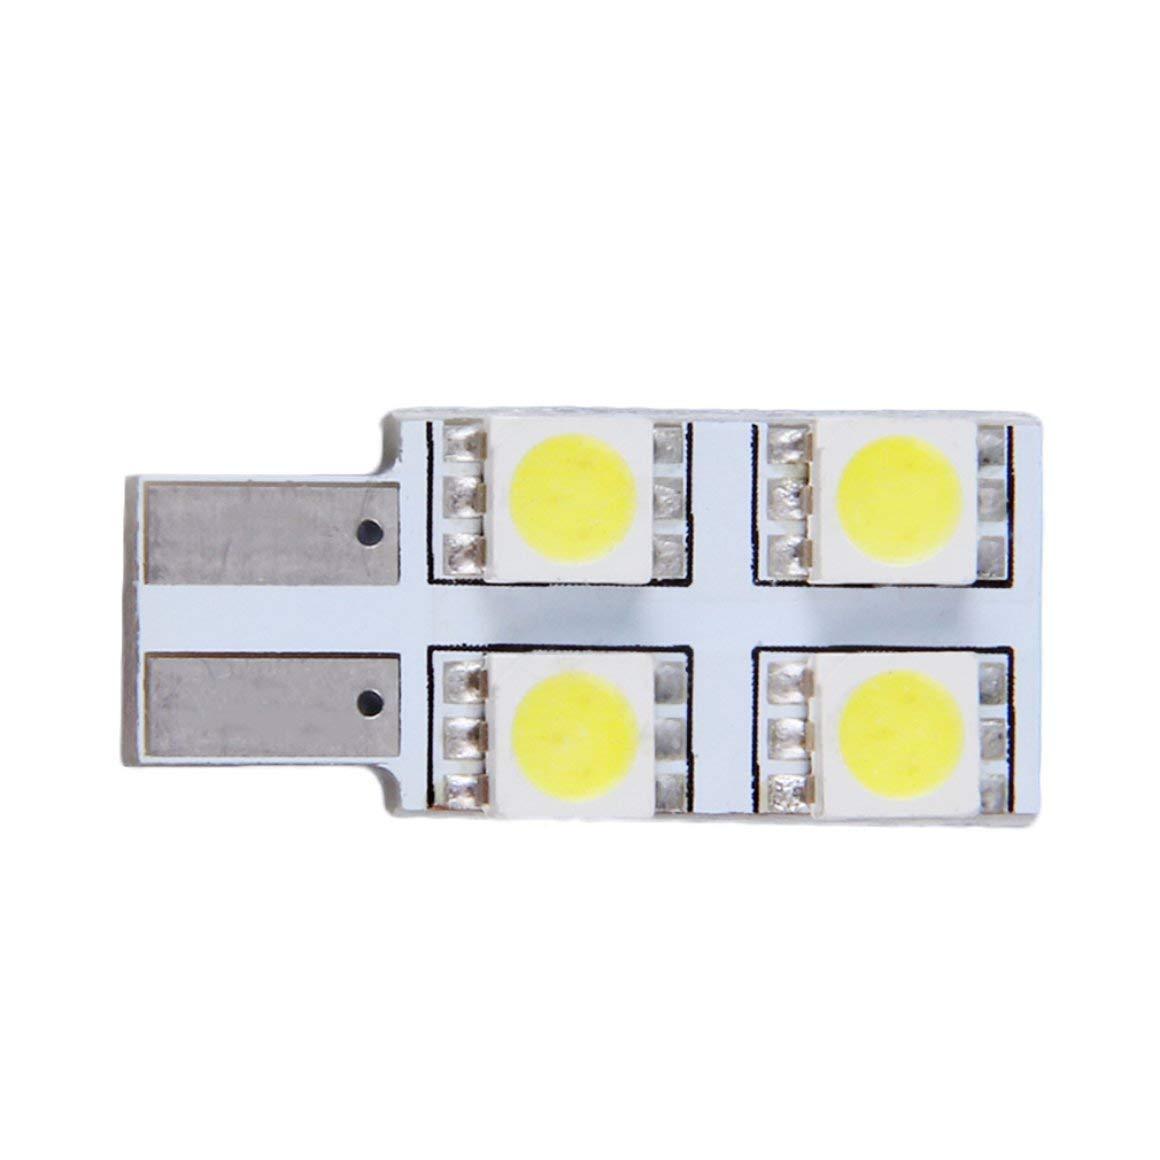 Funnyrunstore T10 5050-4SMD 4 LEDs Car Canbus Interior Panel LED Dome Light Lamp Bulb 12V